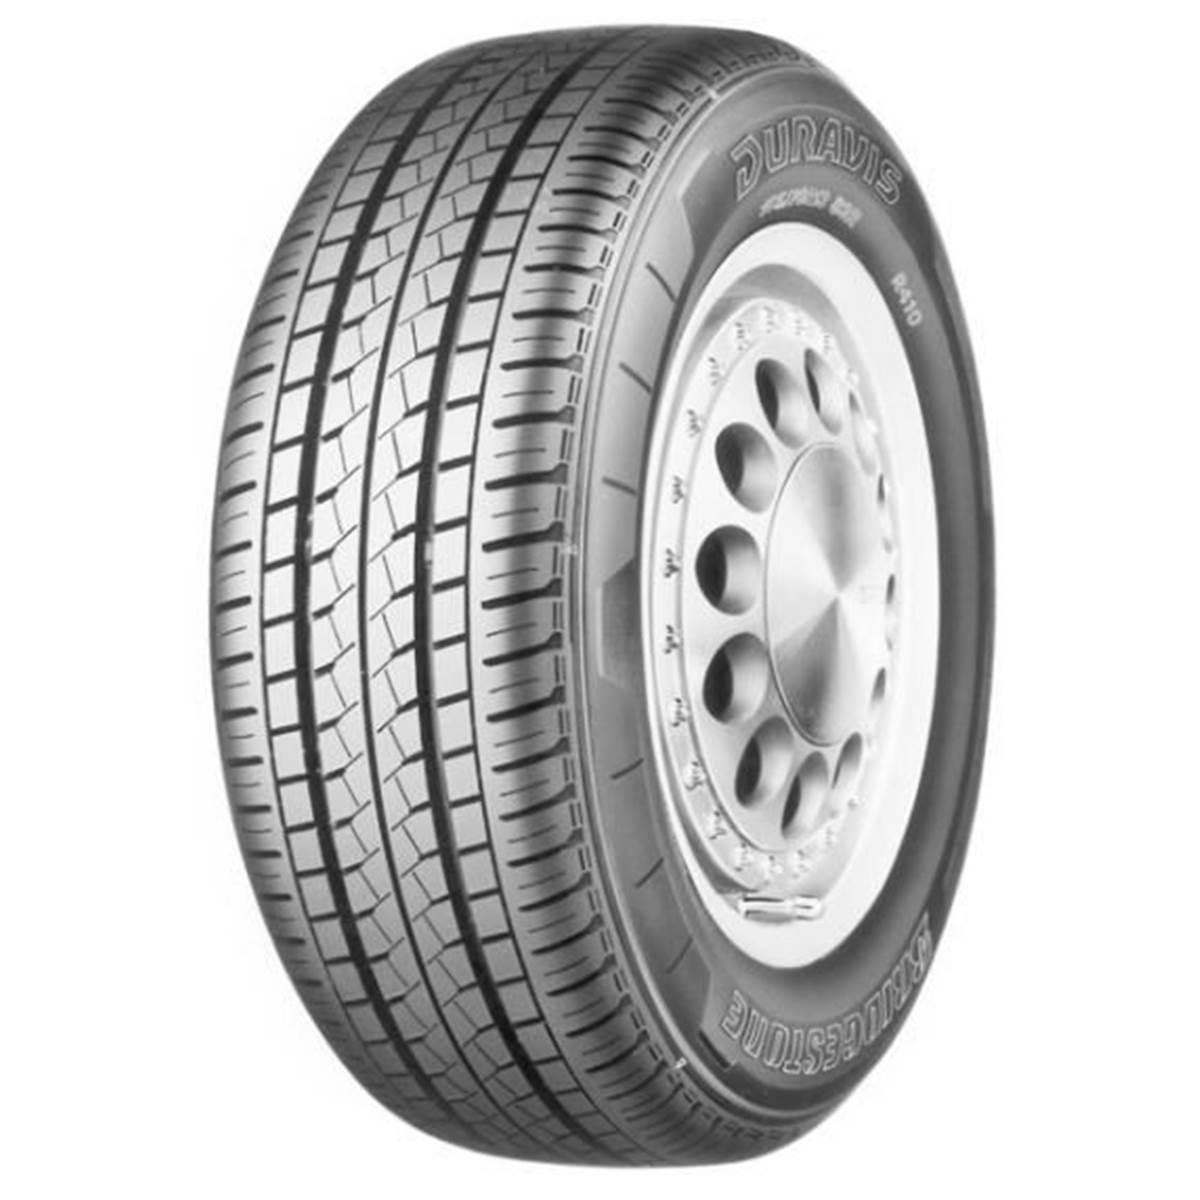 Pneu Camionnette Bridgestone 215/65R16 106T Duravis R410